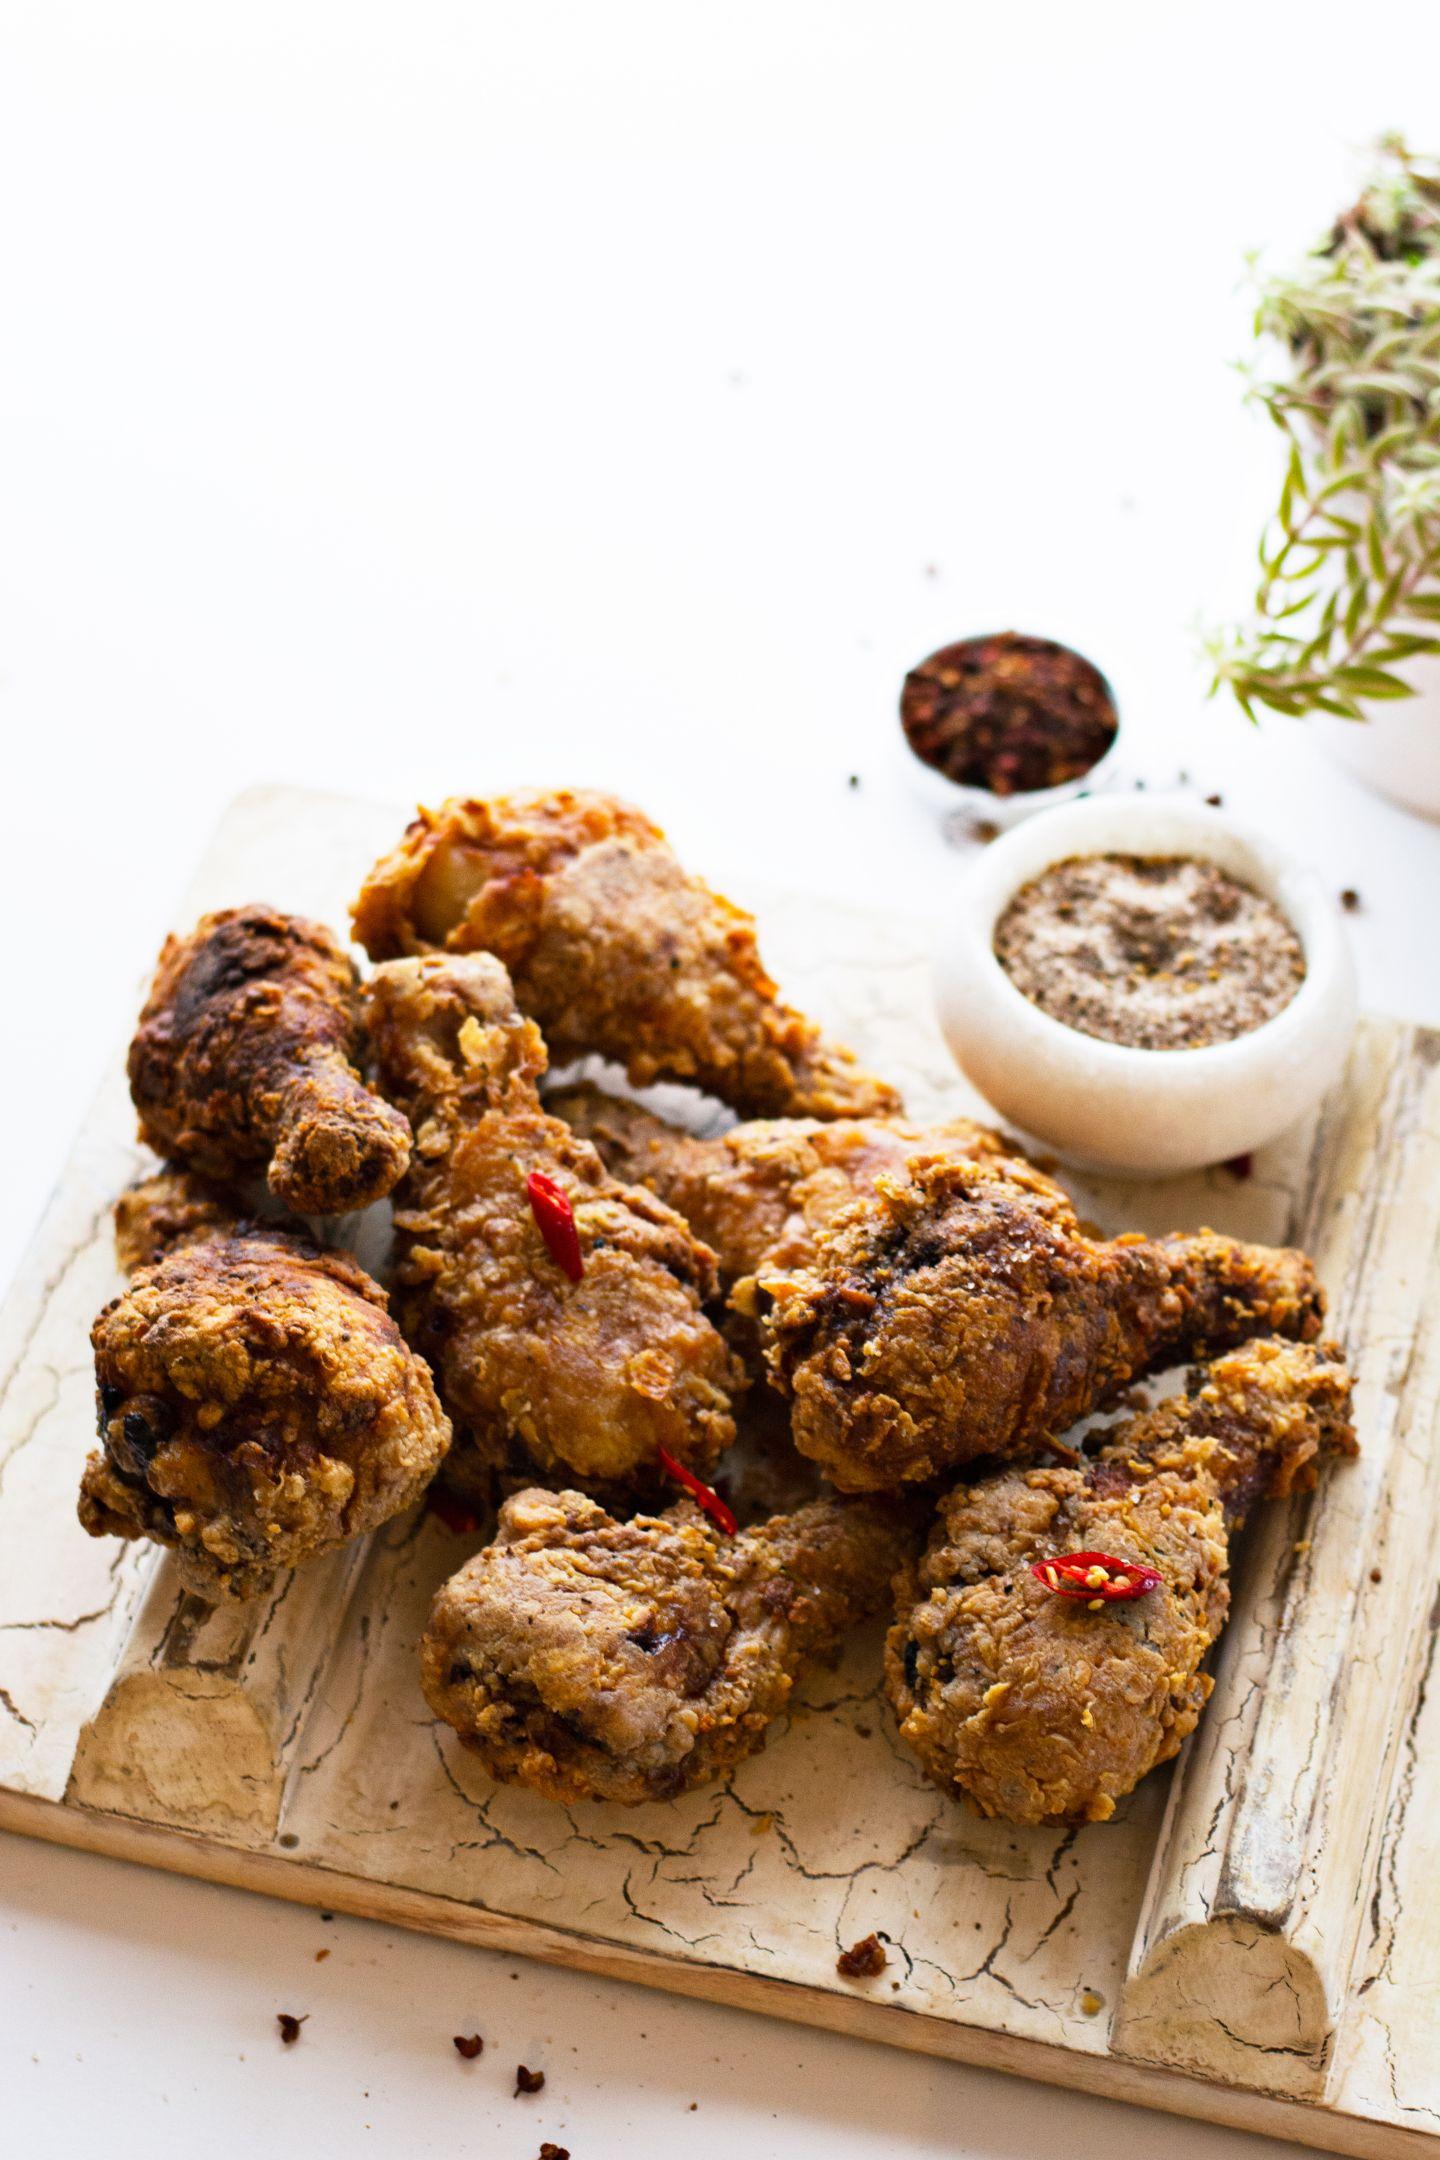 Asian style Fried Chicken Drumsticks Fried chicken